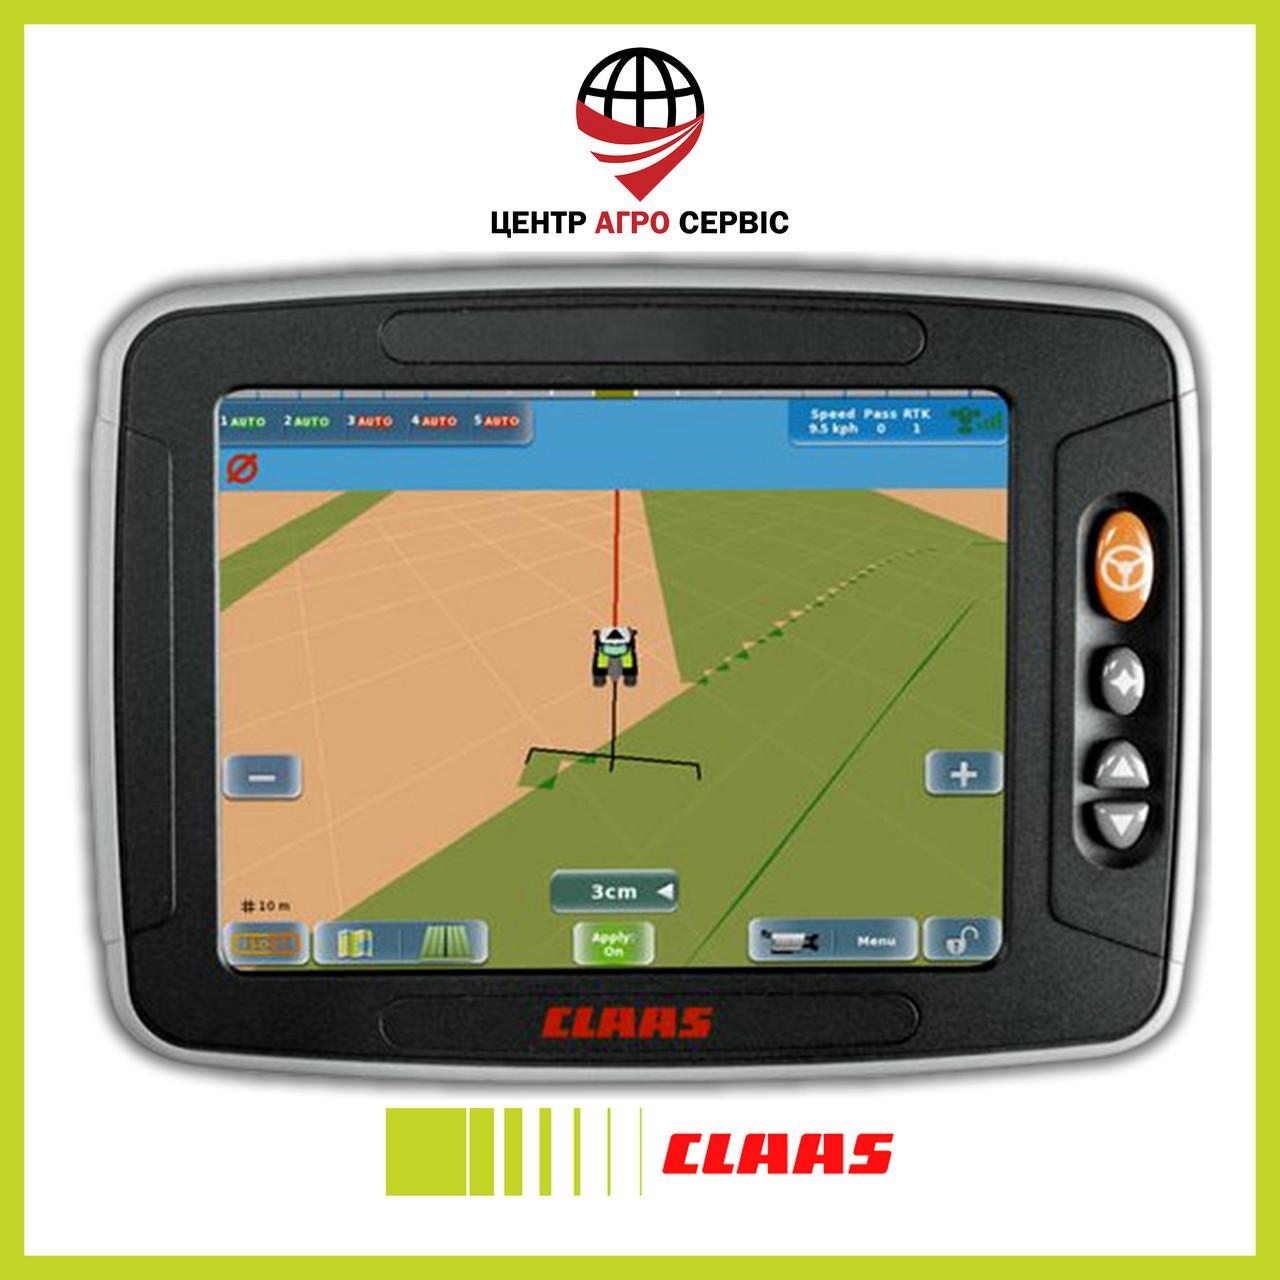 Система паралельного водіння CLAAS gps copilot s10